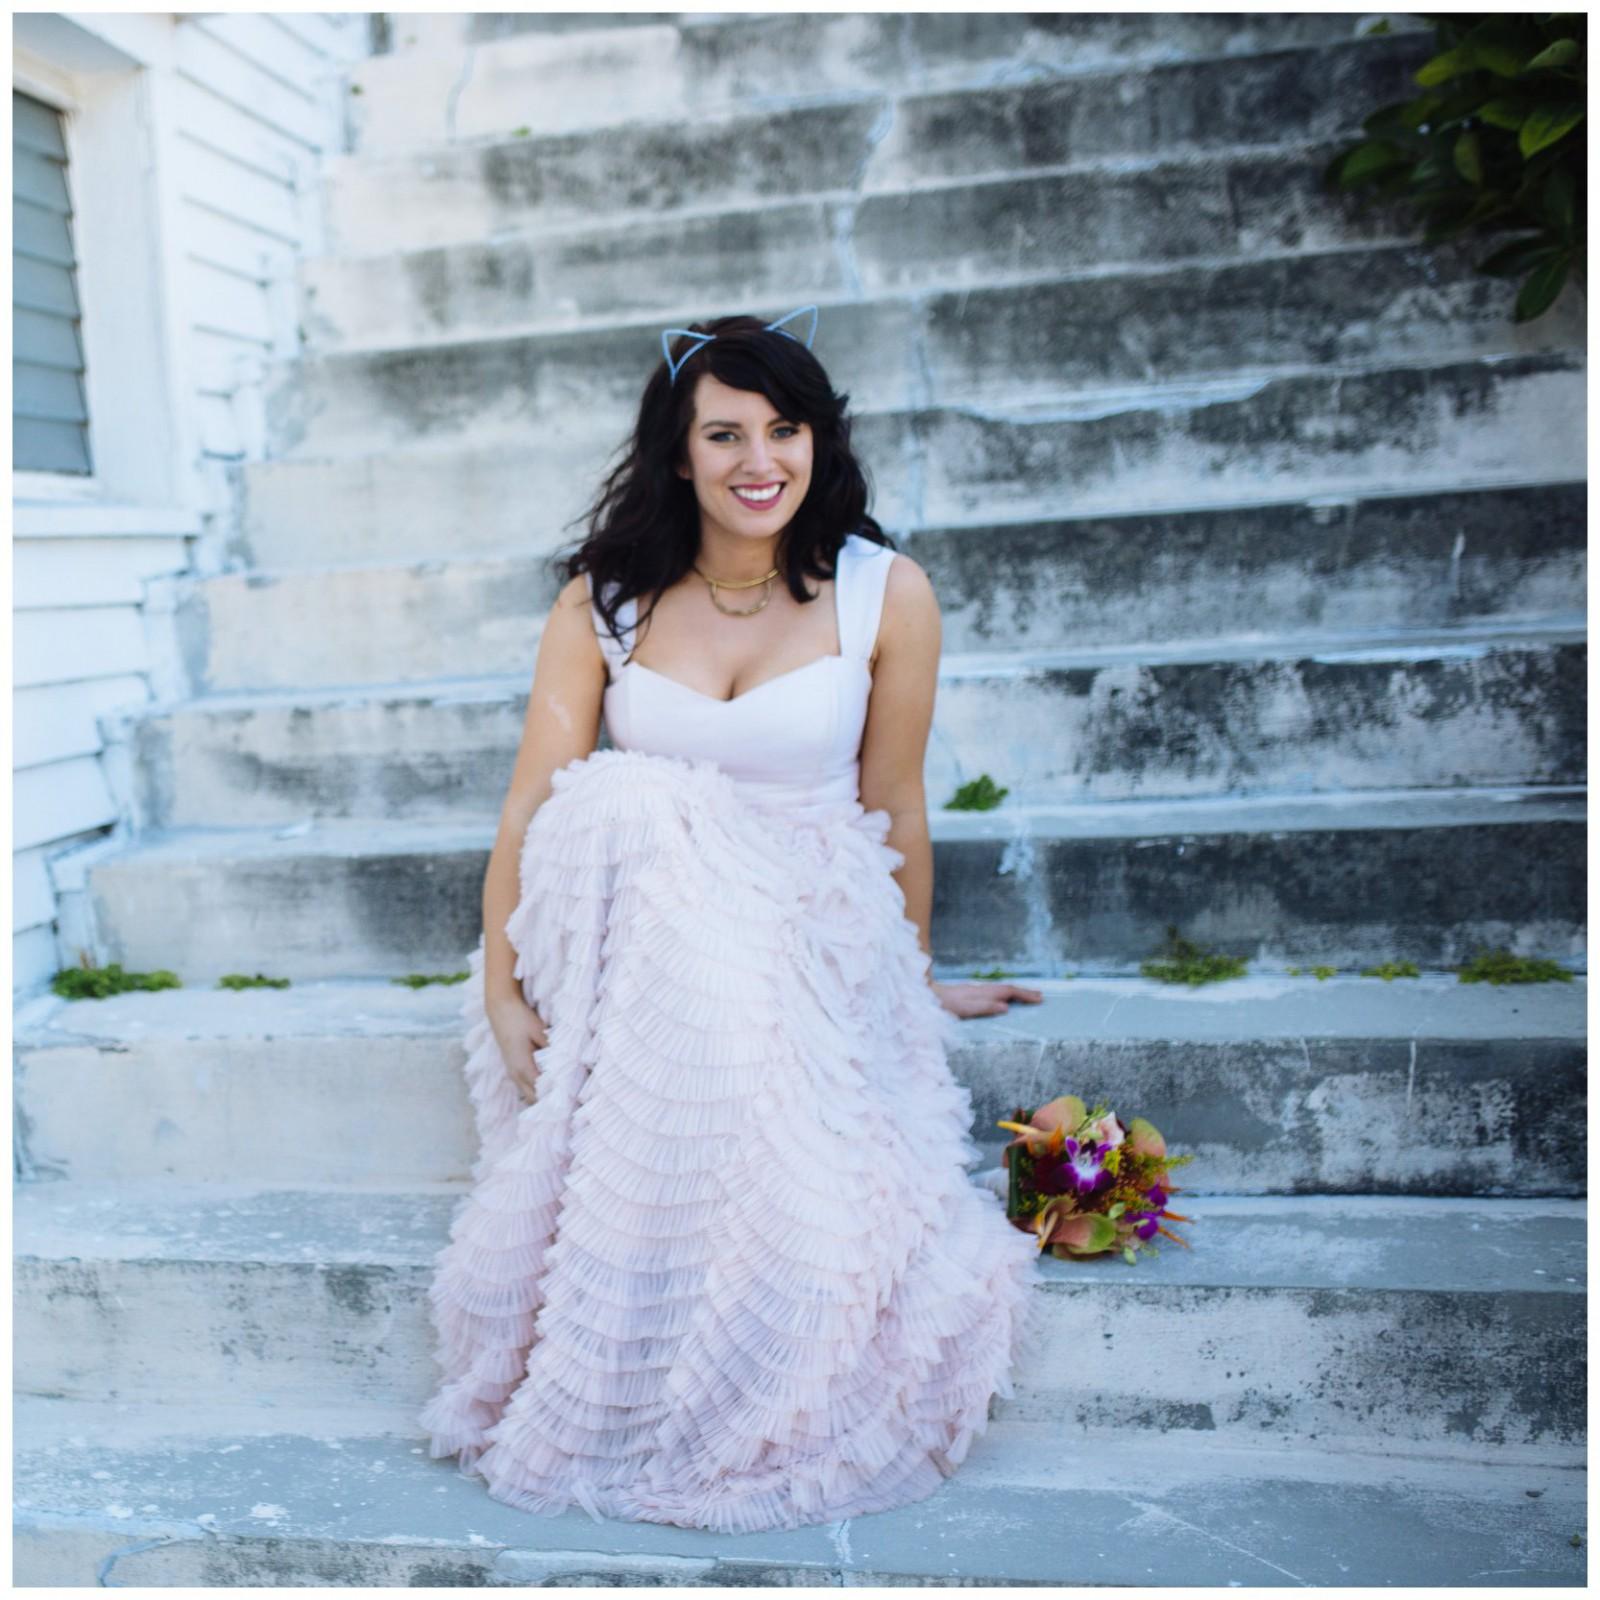 Elizabeth dye tea blush sample wedding dress on sale 54 off for Wedding dress sample sale san francisco